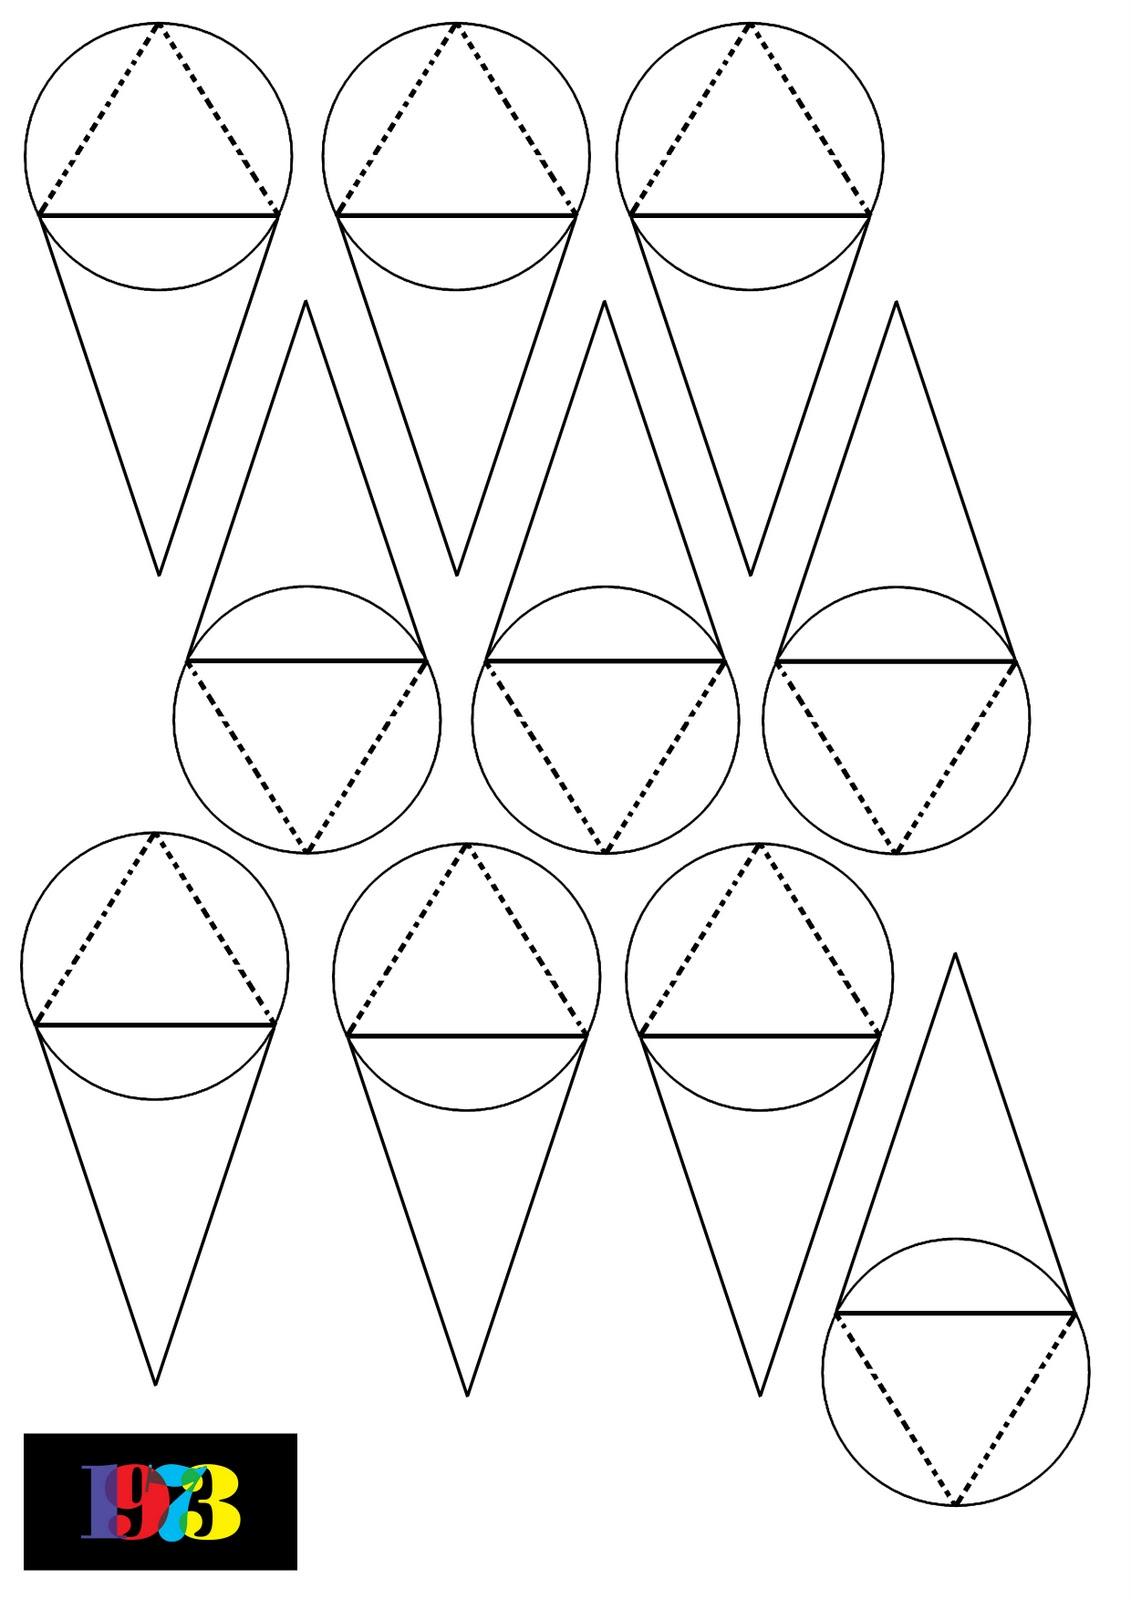 Nineteenseventythreeltd paper craft stars for Paper star pattern template